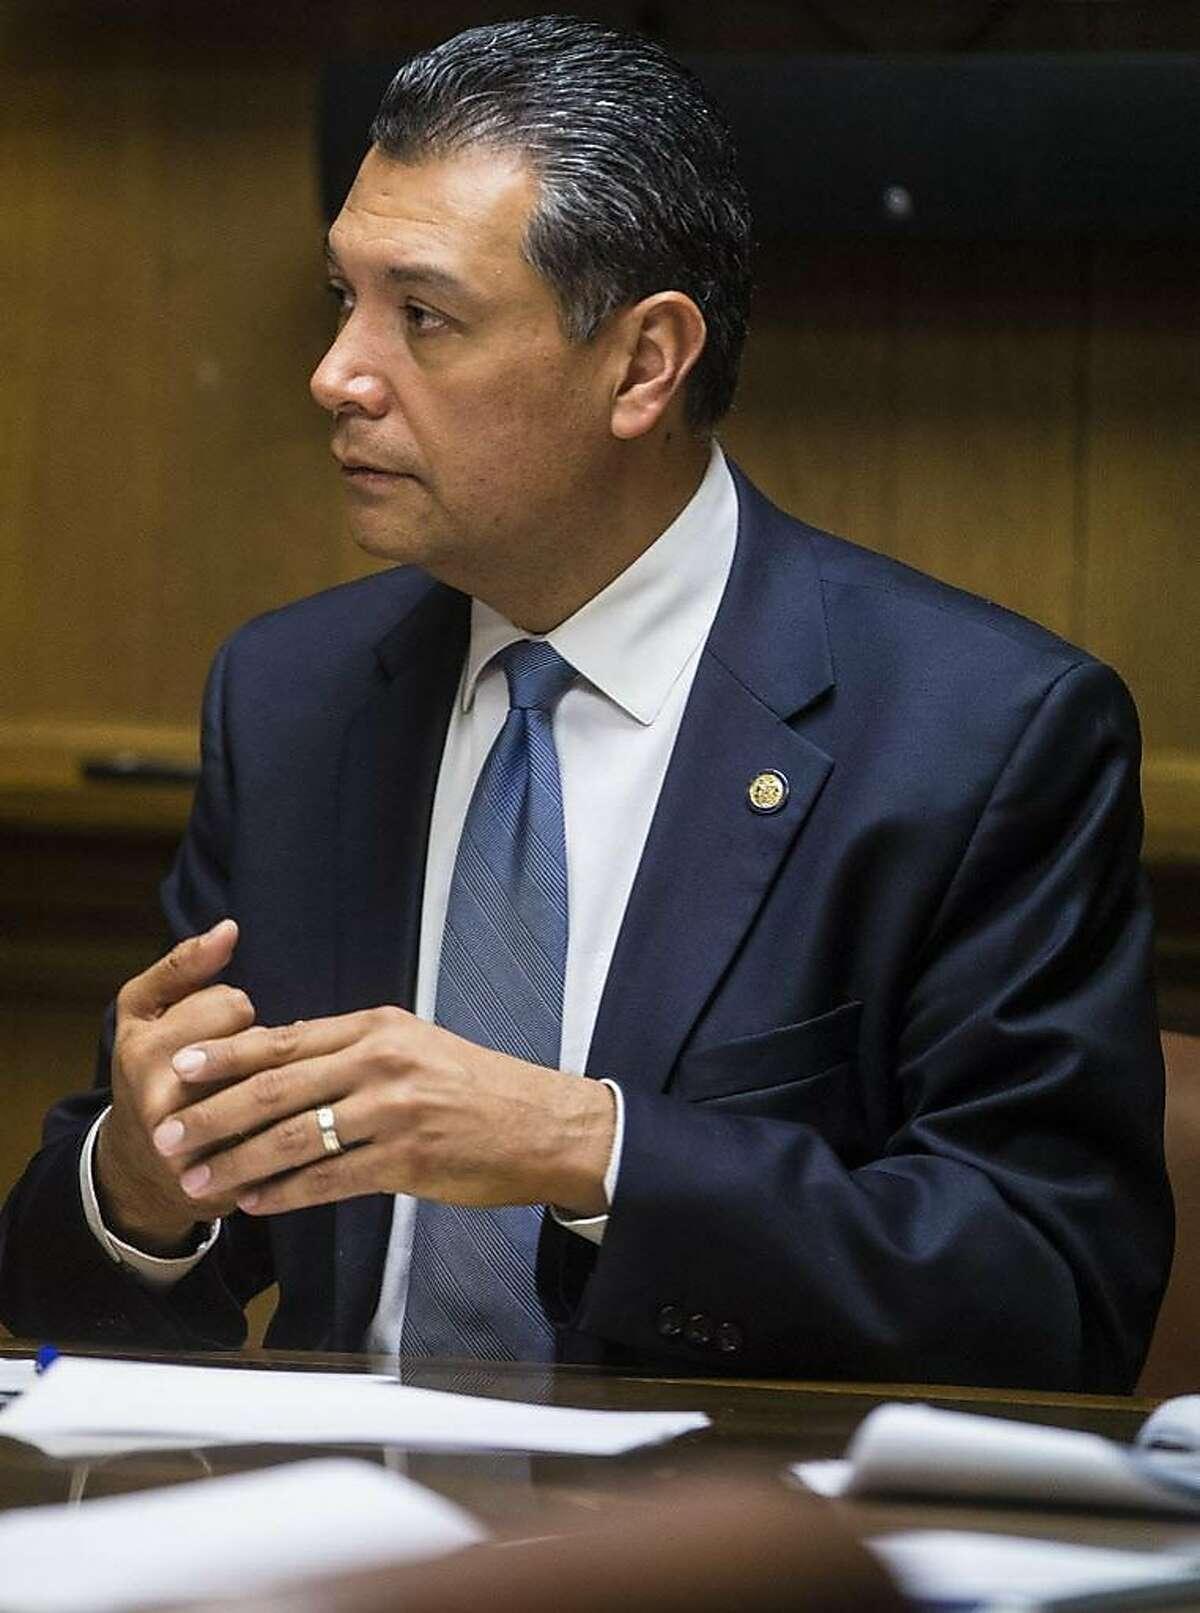 California Secretary of State Alex Padilla speaks to the San Francisco Chronicle editorial board Tuesday, Jan. 30, 2018 at the San Francisco Chronicle newsroom in San Francisco, Calif.